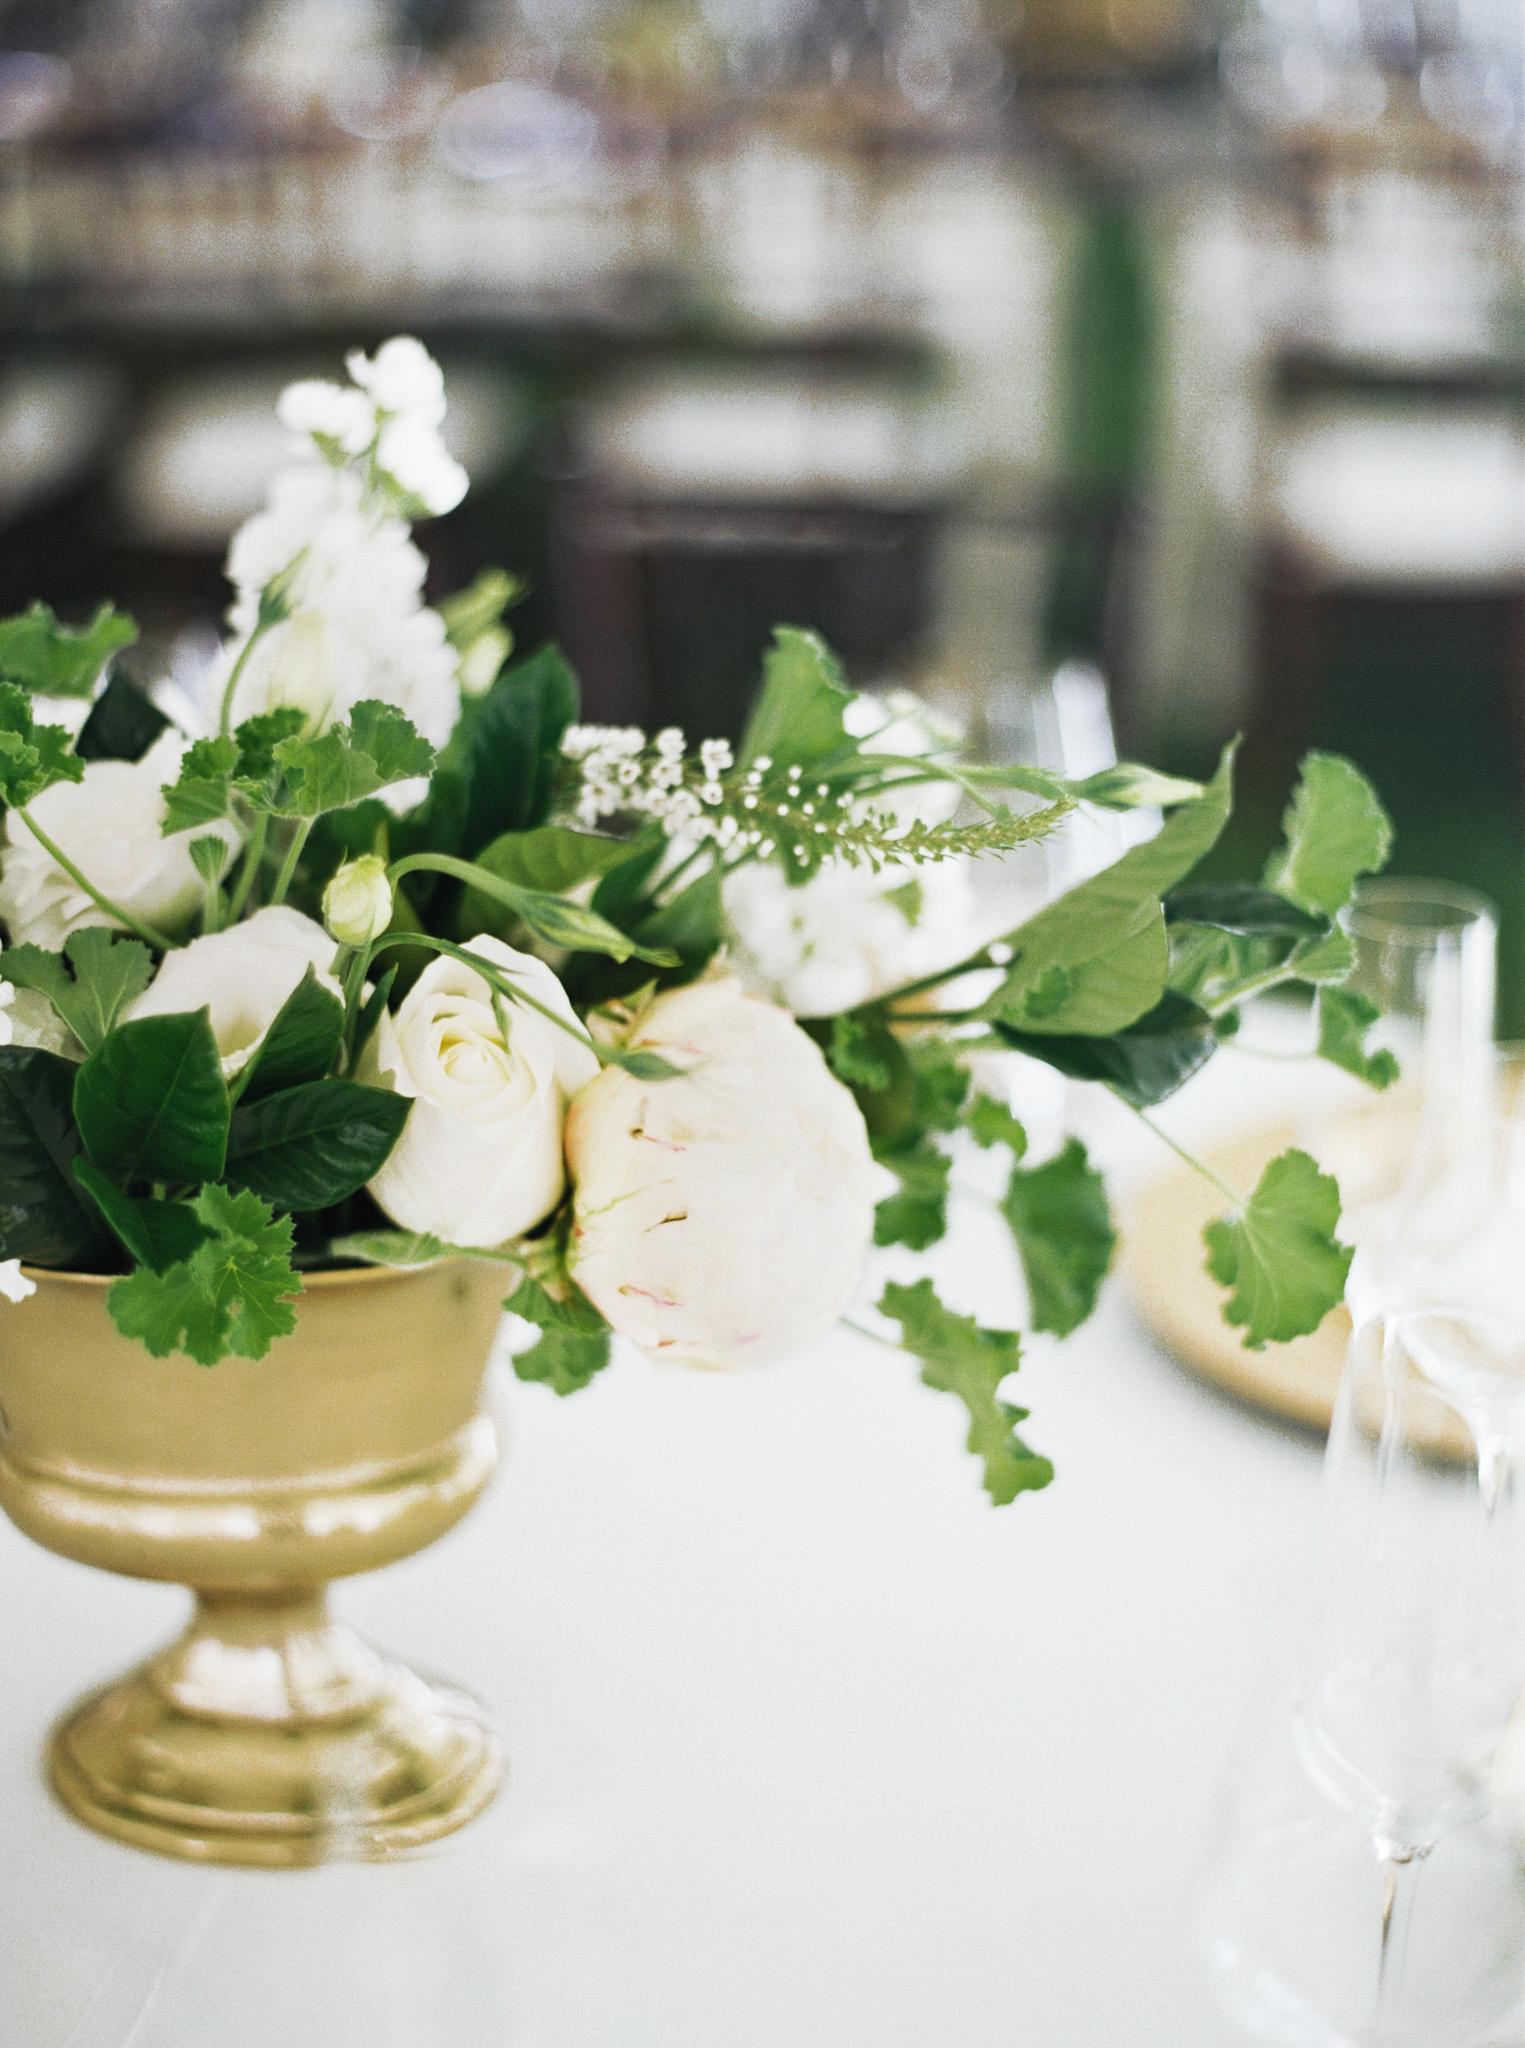 170OutliveCreative_Travel_Photographer_Videographer_Lewis&Clark_Oregon_Elegant_BlackTie_Destination_Wedding.jpg